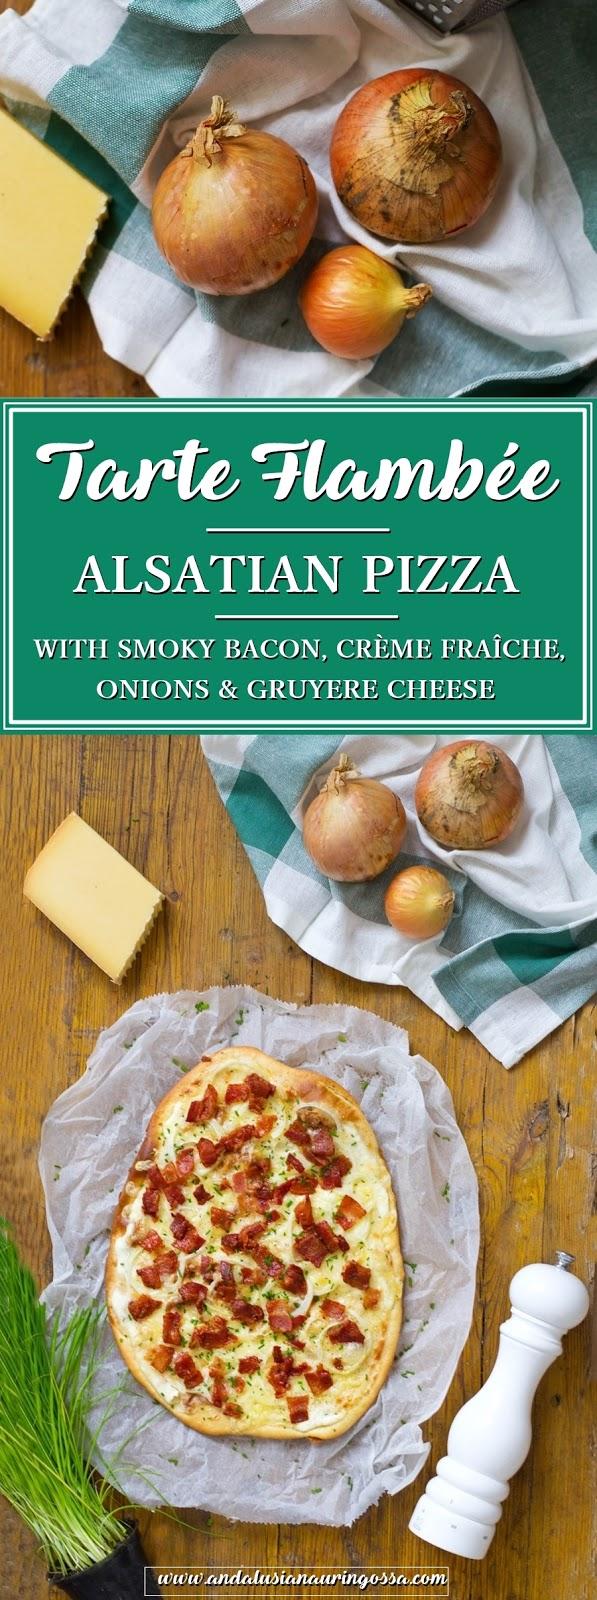 Tarte Flambee_Flammkuche_recipe_Alsace pizza_Andalusian auringossa_foodblog_PIN ME